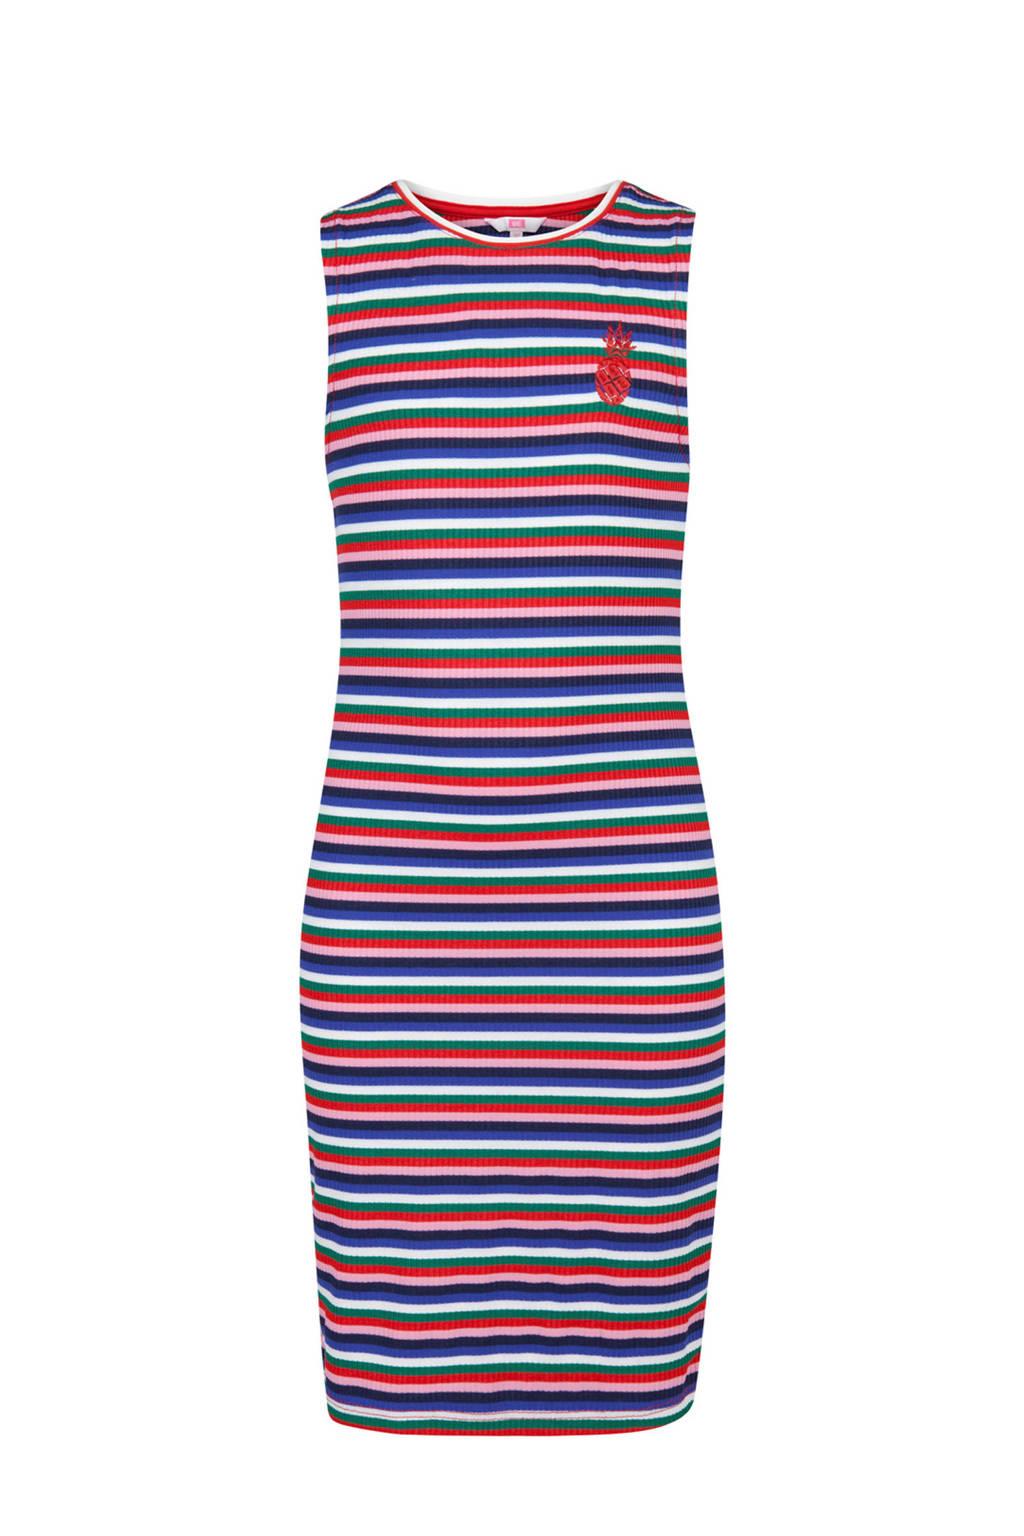 WE Fashion gestreepte maxi jurk blauw, Blauw/rood/roze/groen